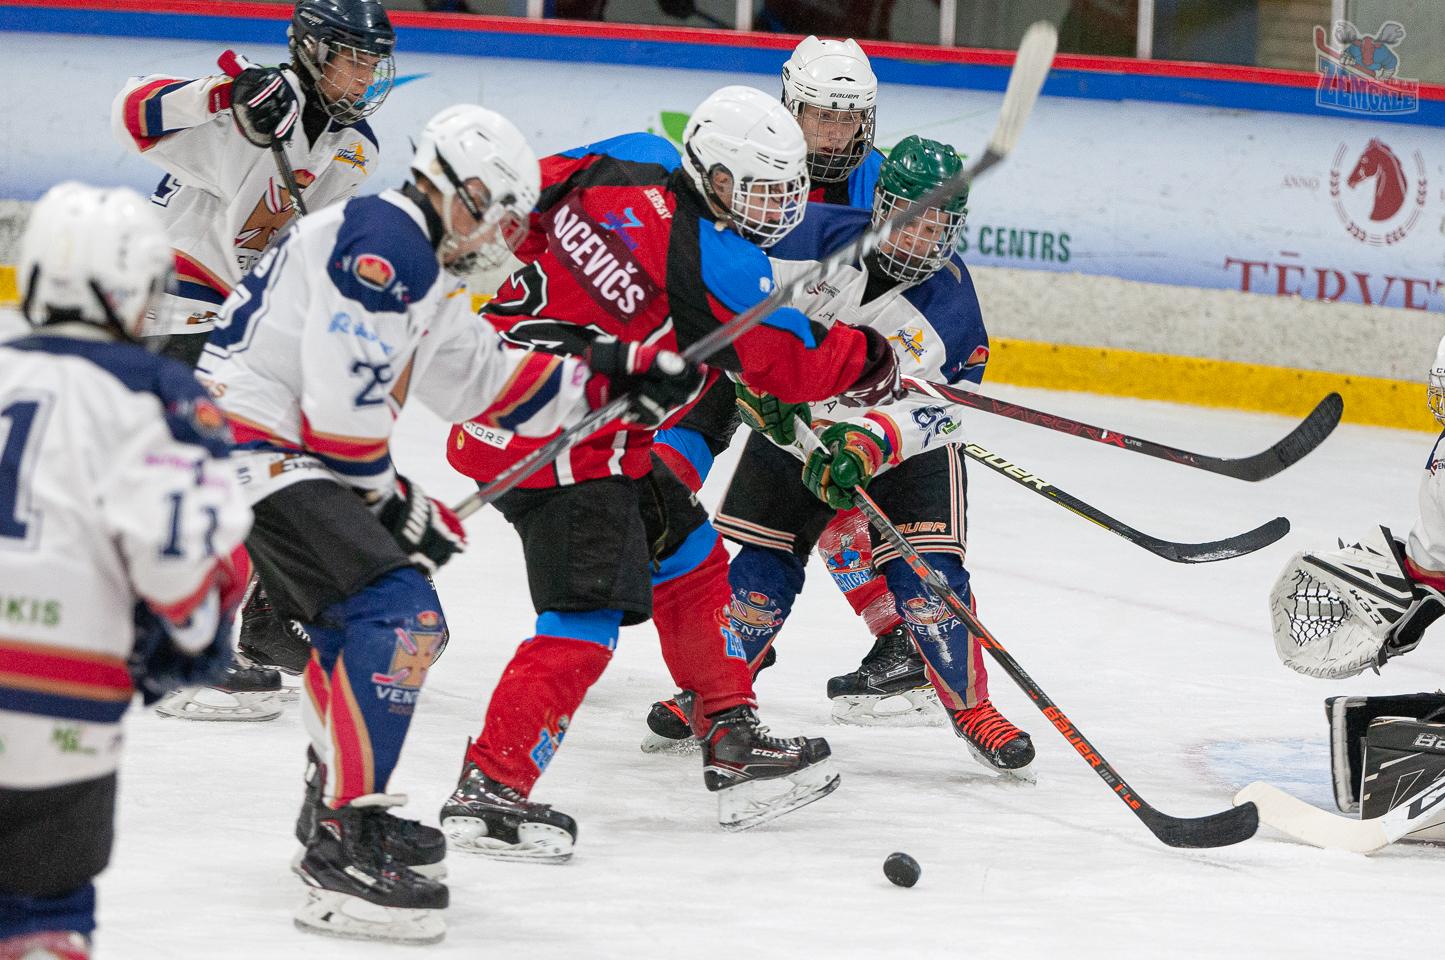 Jelgavas hokeja skola JLSS U17 - Venta 2002 14092019-07